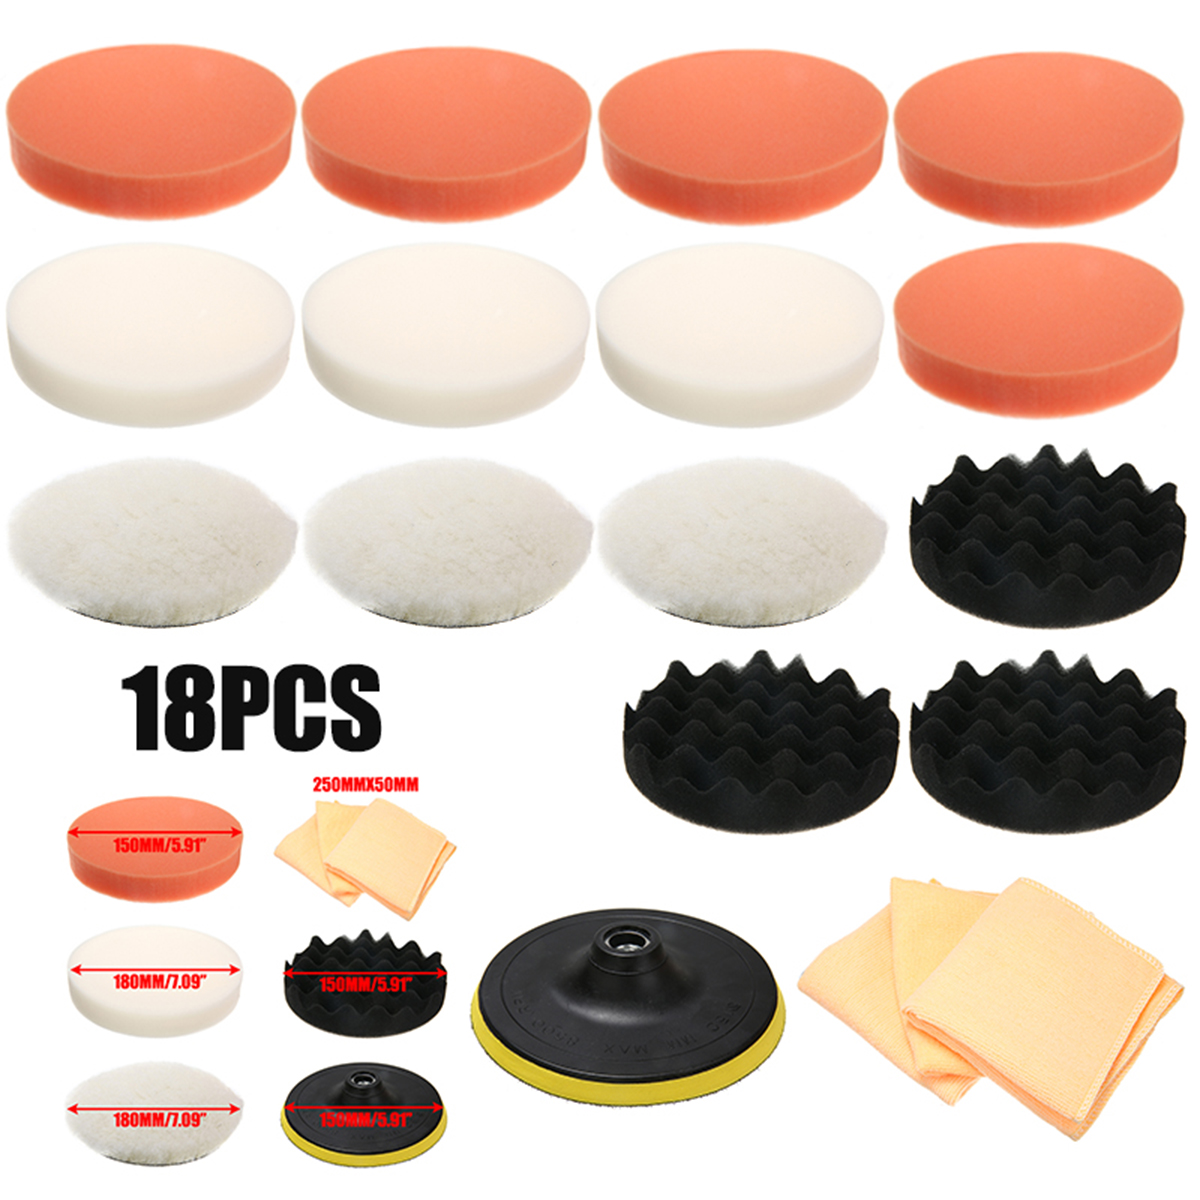 18Pcs/set Plastic Polishing Sponge Polishing Pads Adapter Microfiber Cloth Kit for Polishing Machine Power Tools Accessories Polishing Pads     - title=